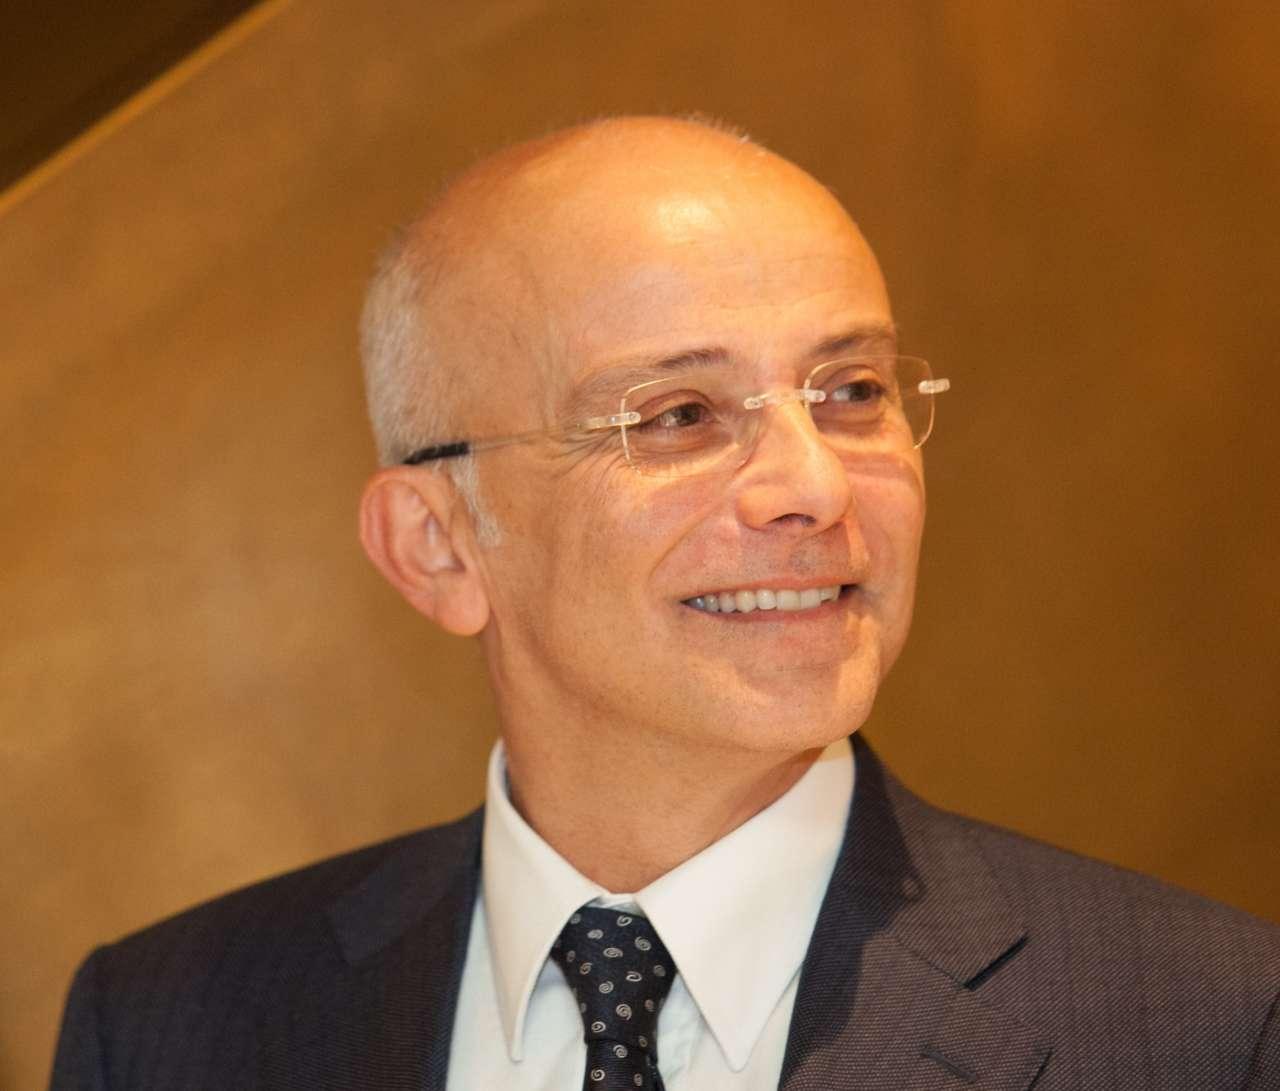 Paolo Sironi, CEO Intesi Group